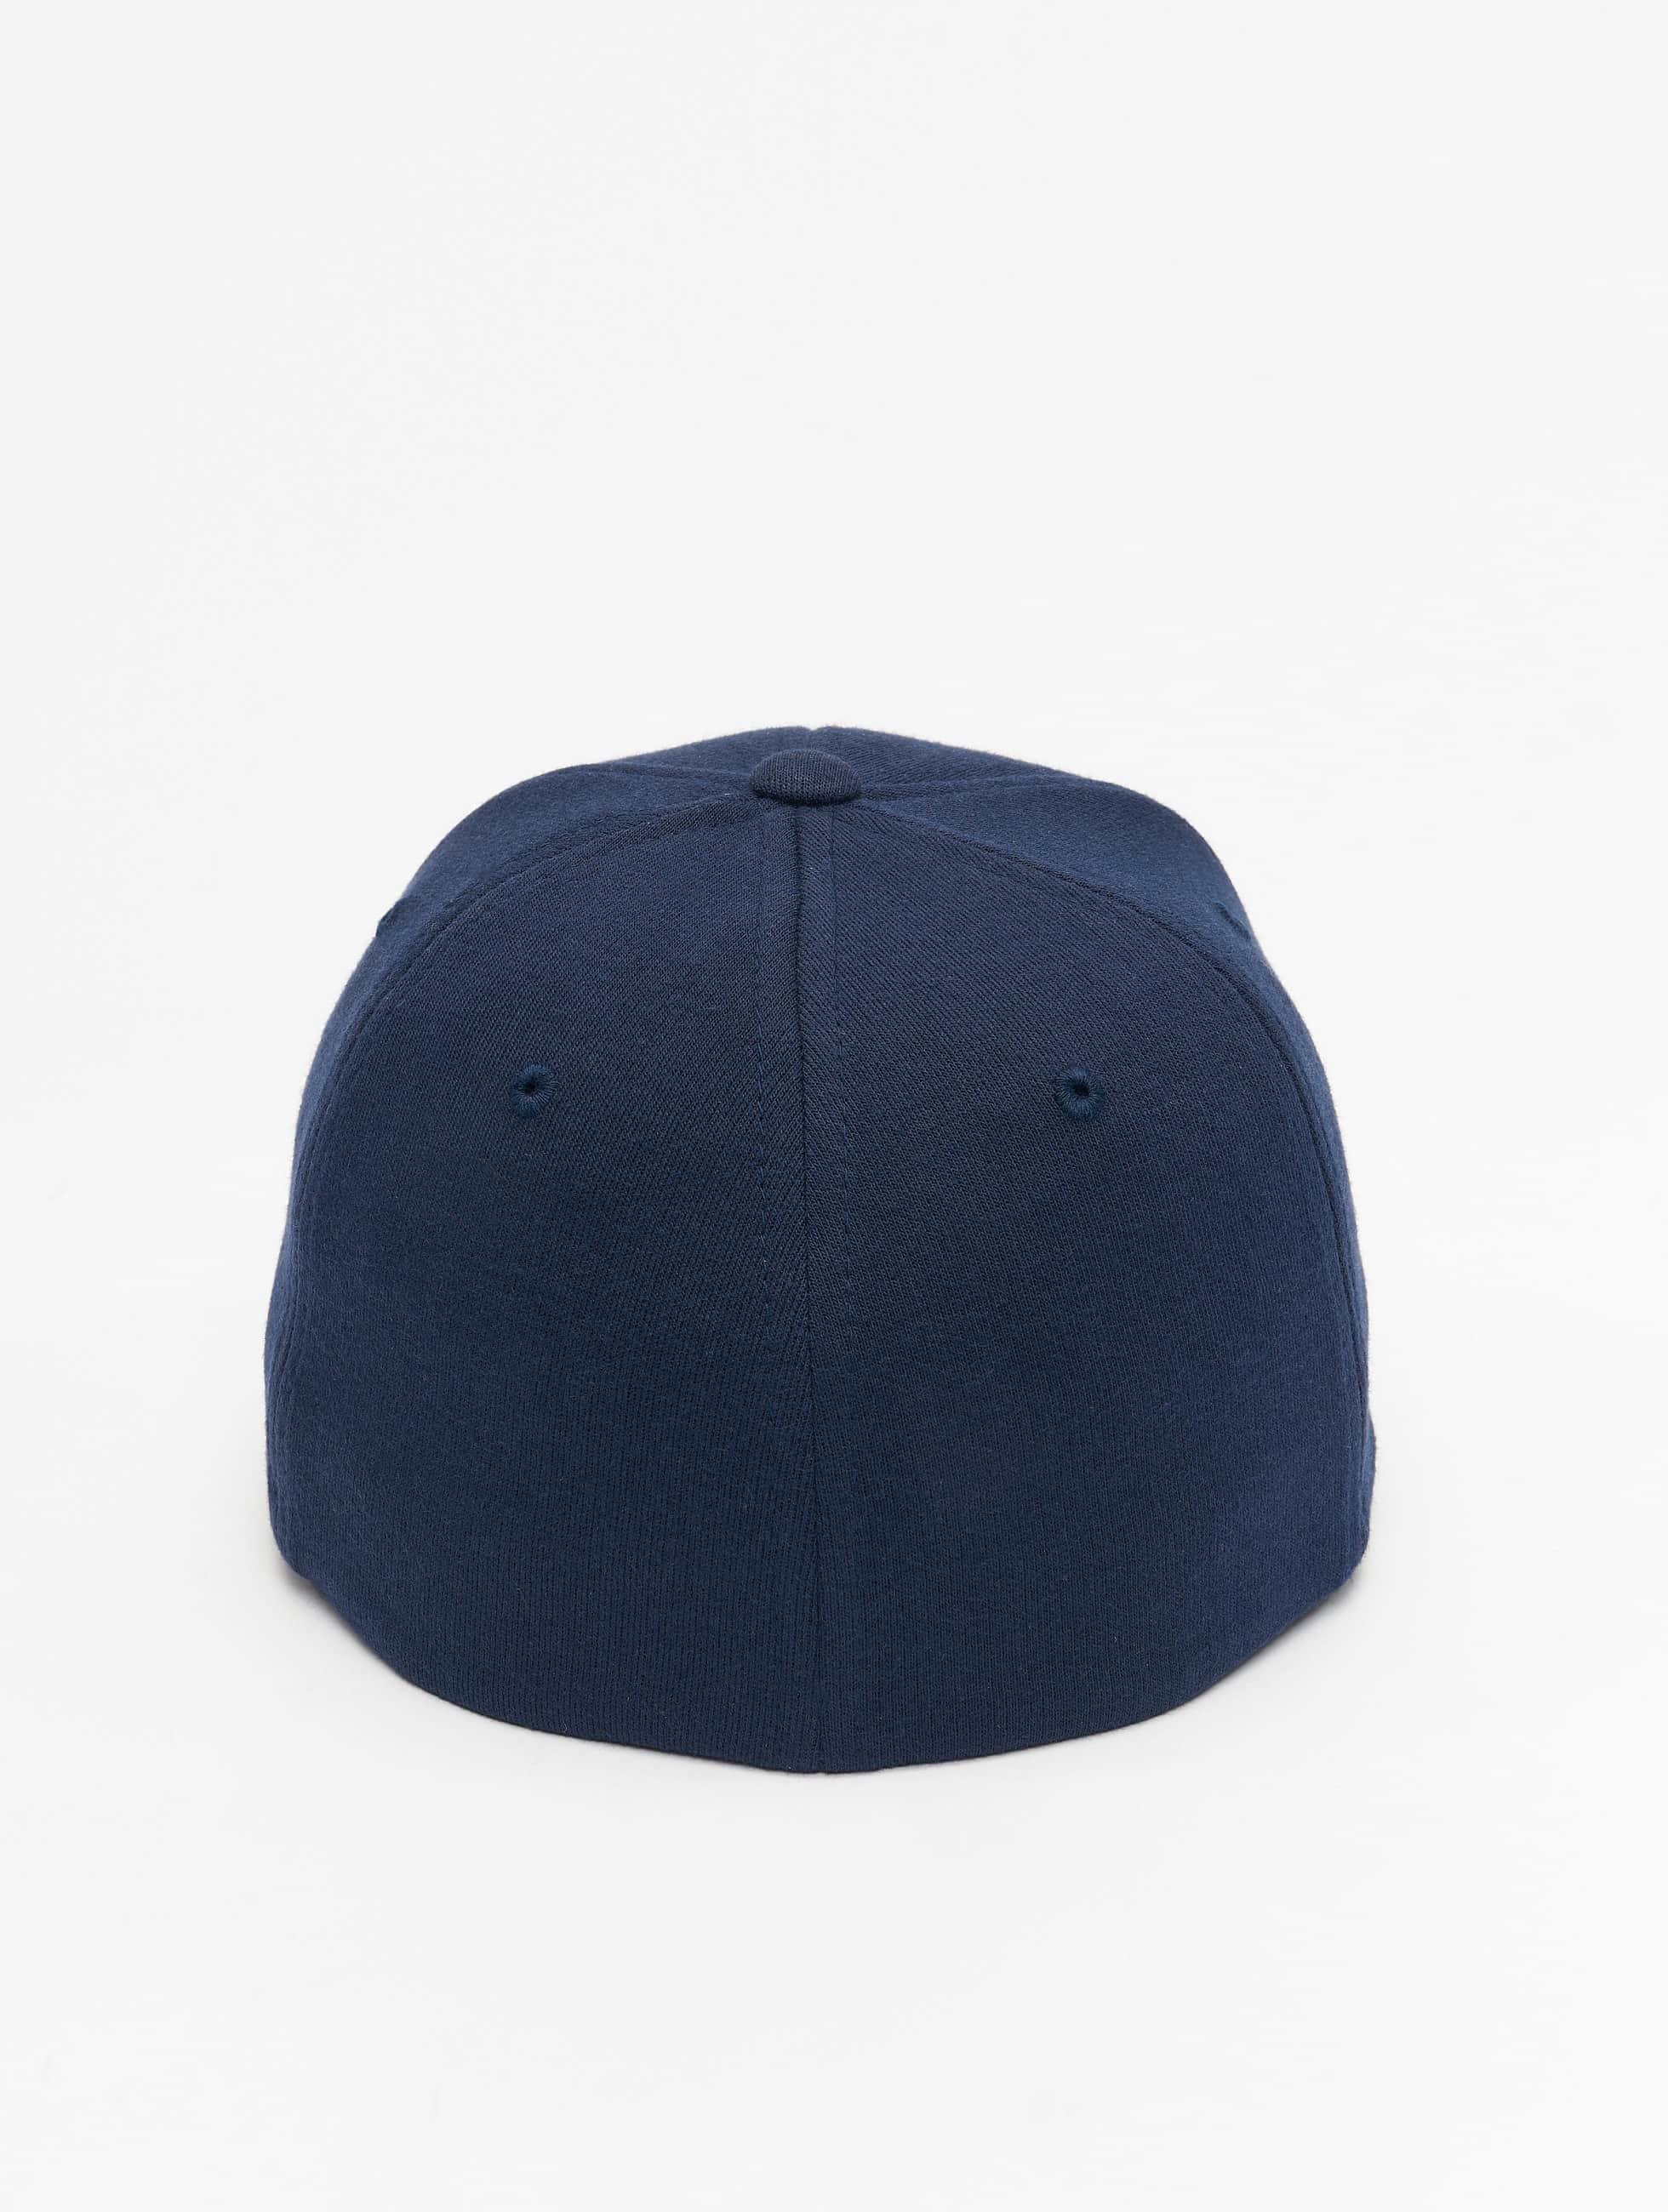 Flexfit Бейсболкa Flexfit Double Jersey синий